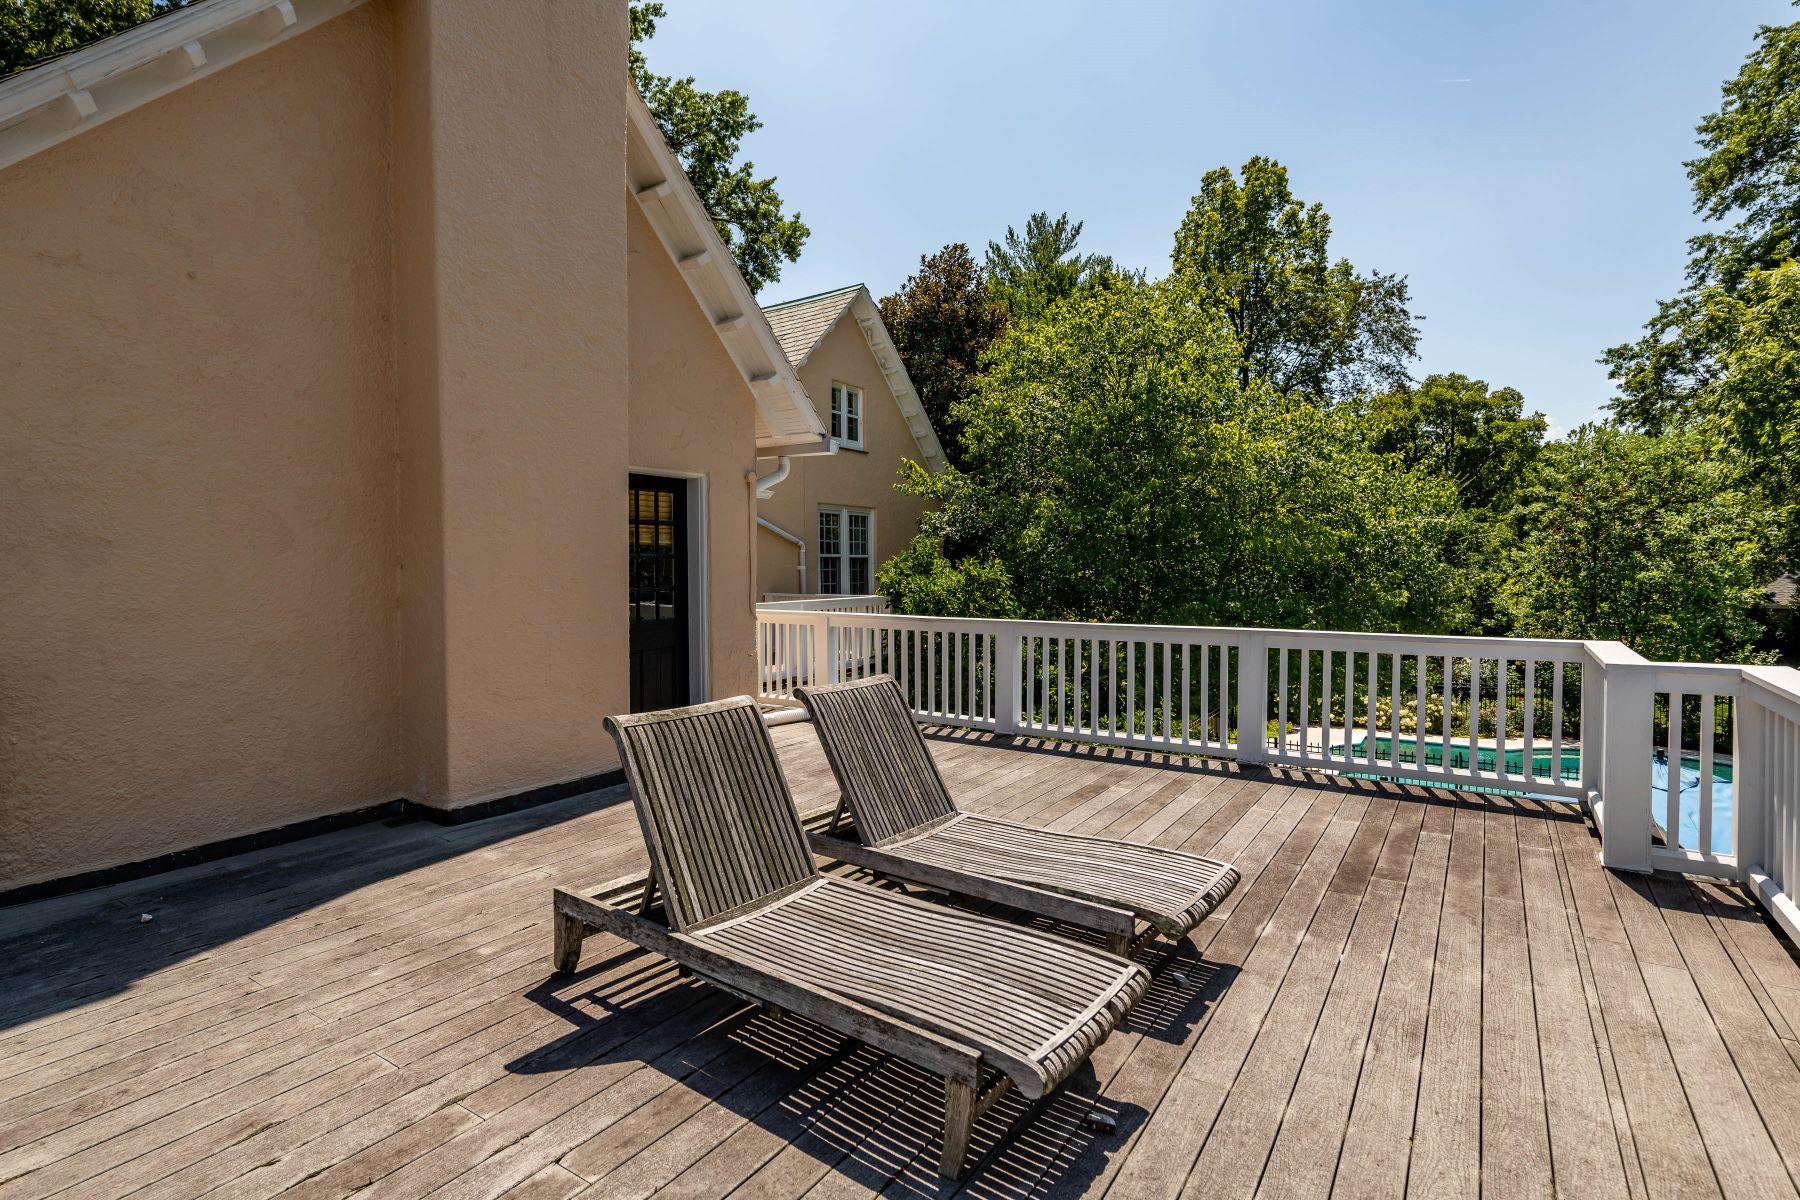 Additional photo for property listing at Gracious Historic Kirkwood Home 333 Dickson Street Kirkwood, Missouri 63122 United States